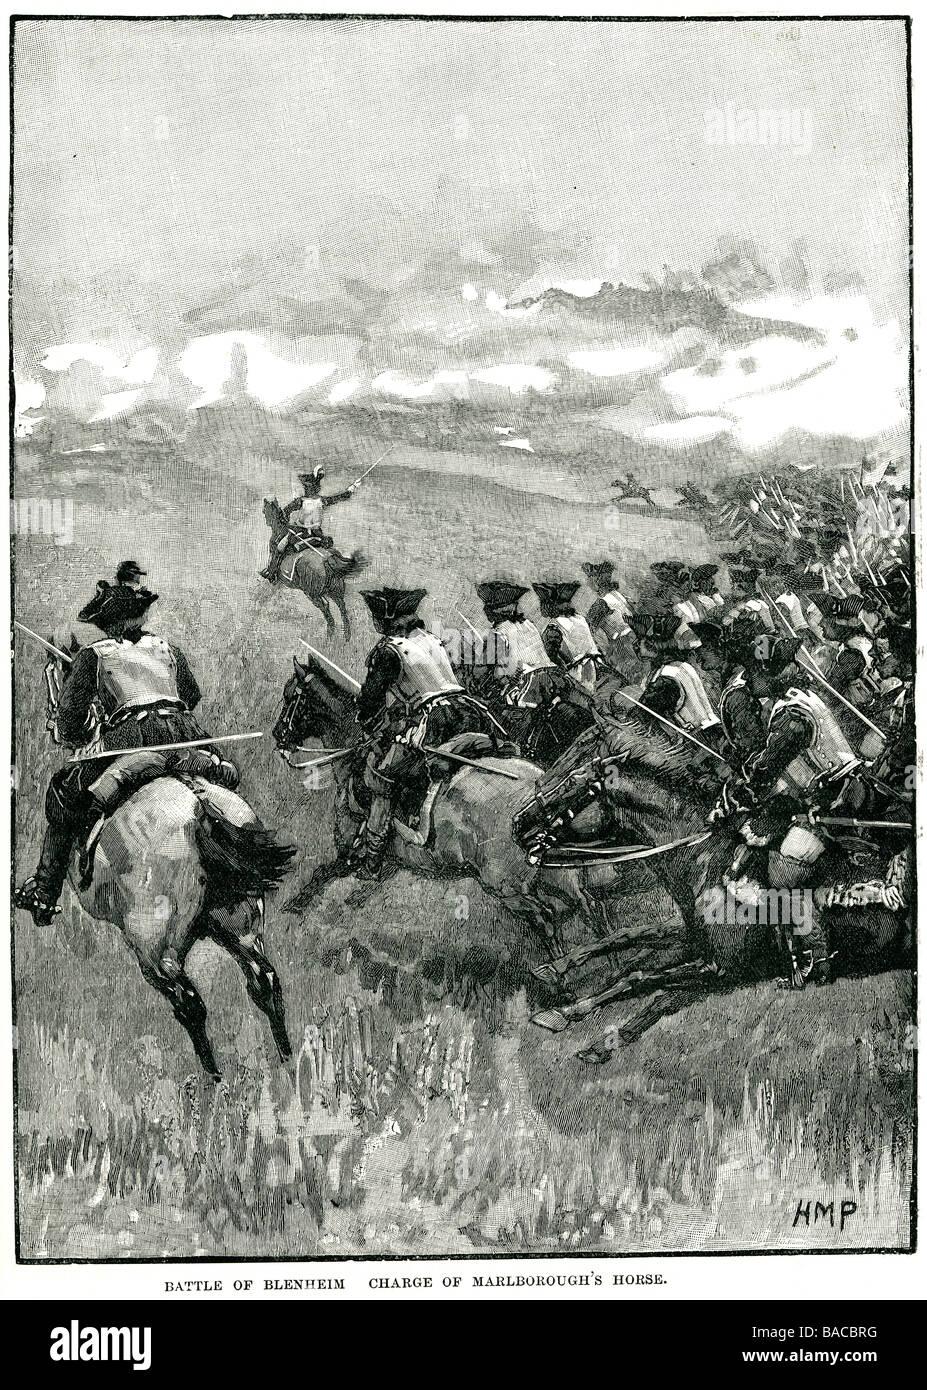 battle of blenheim charge of marlborough's horse Battle of Höchstädt 13 August 1704 major War Spanish offensive Stock Photo